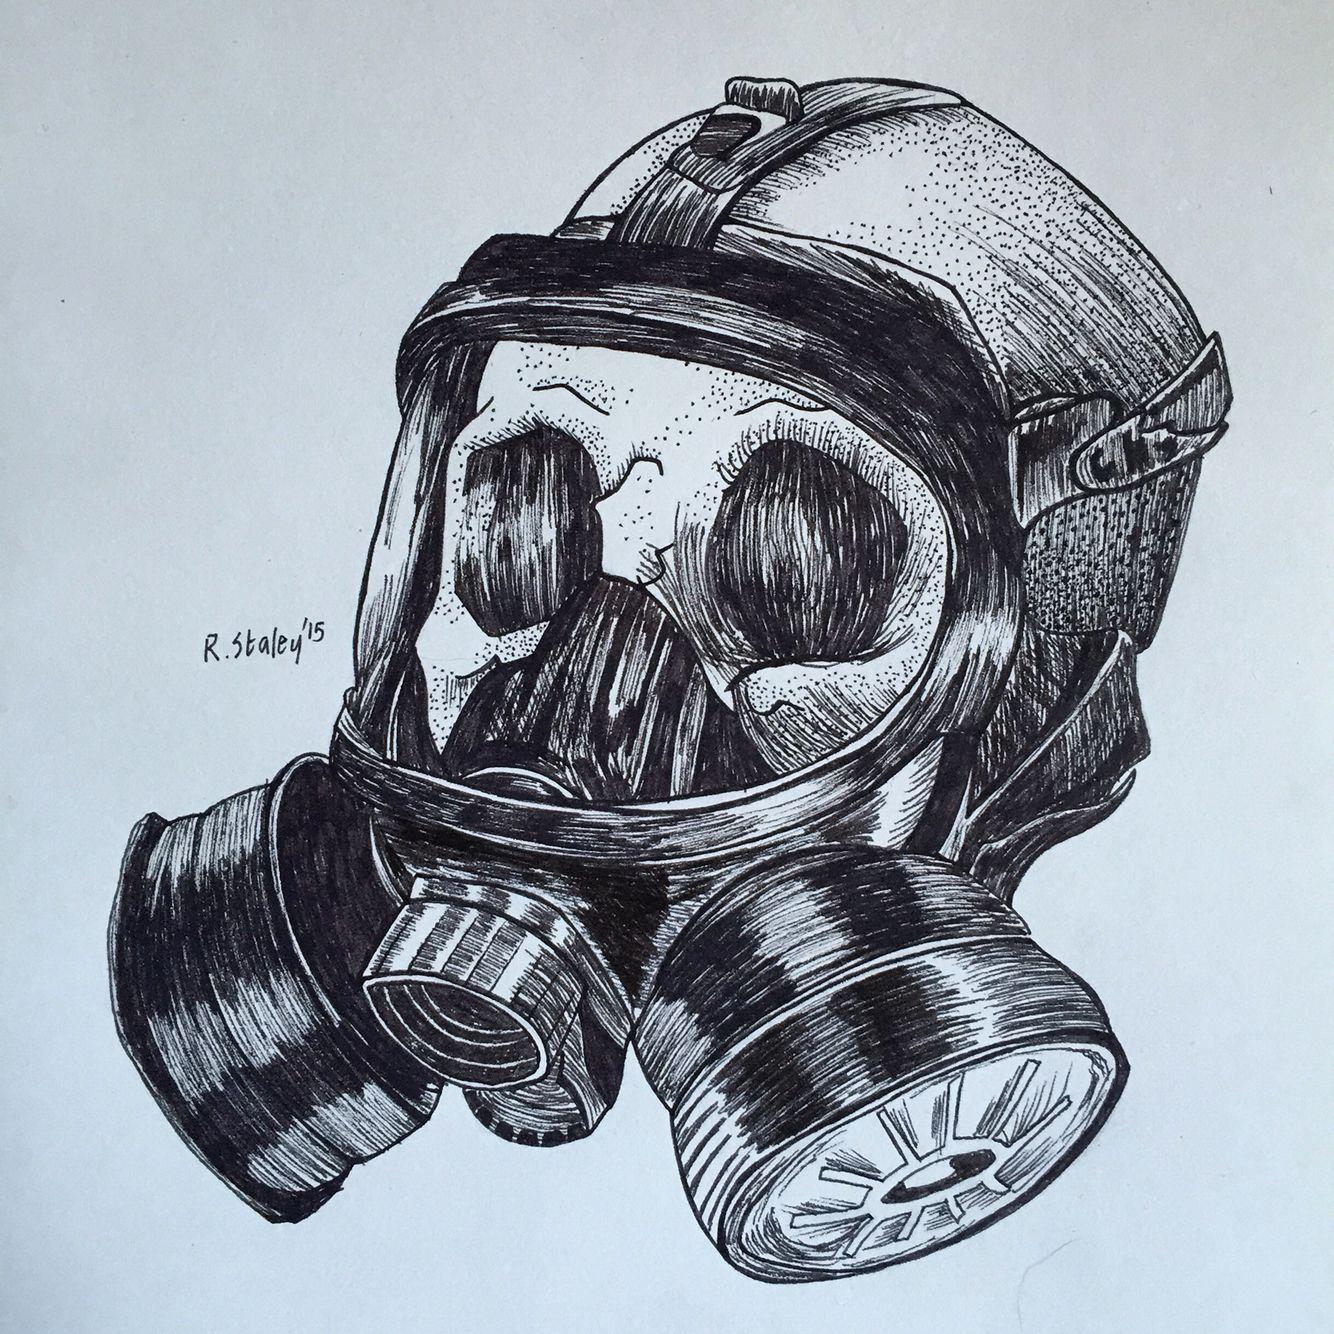 Ww2 skull clipart clip art download WW2 Gas Mask in Skull | Tattoo ideas in 2019 | Gas mask art ... clip art download